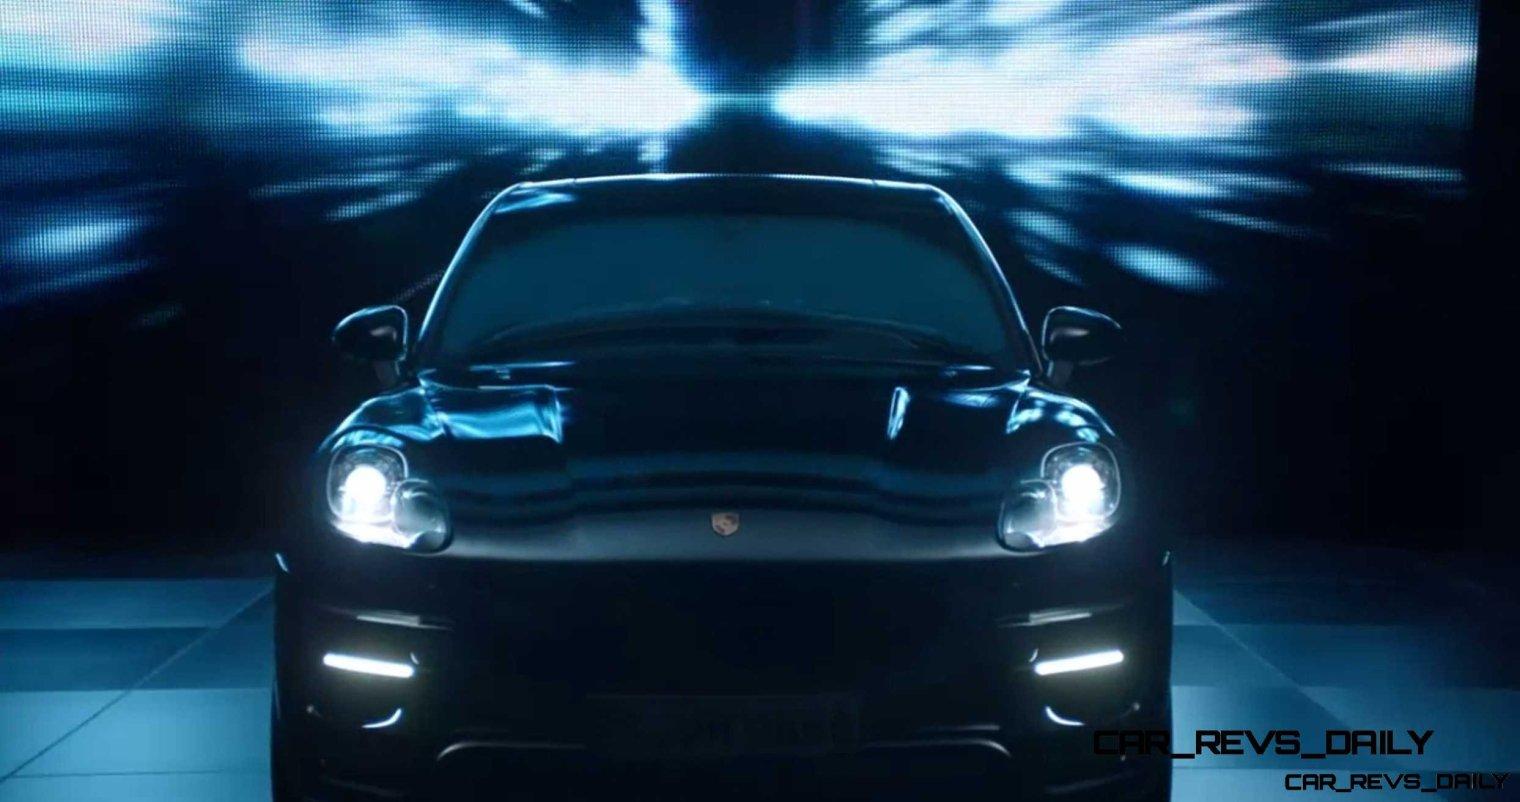 2015 Porsche Macan - Latest Images - CarRevsDaily.com 37